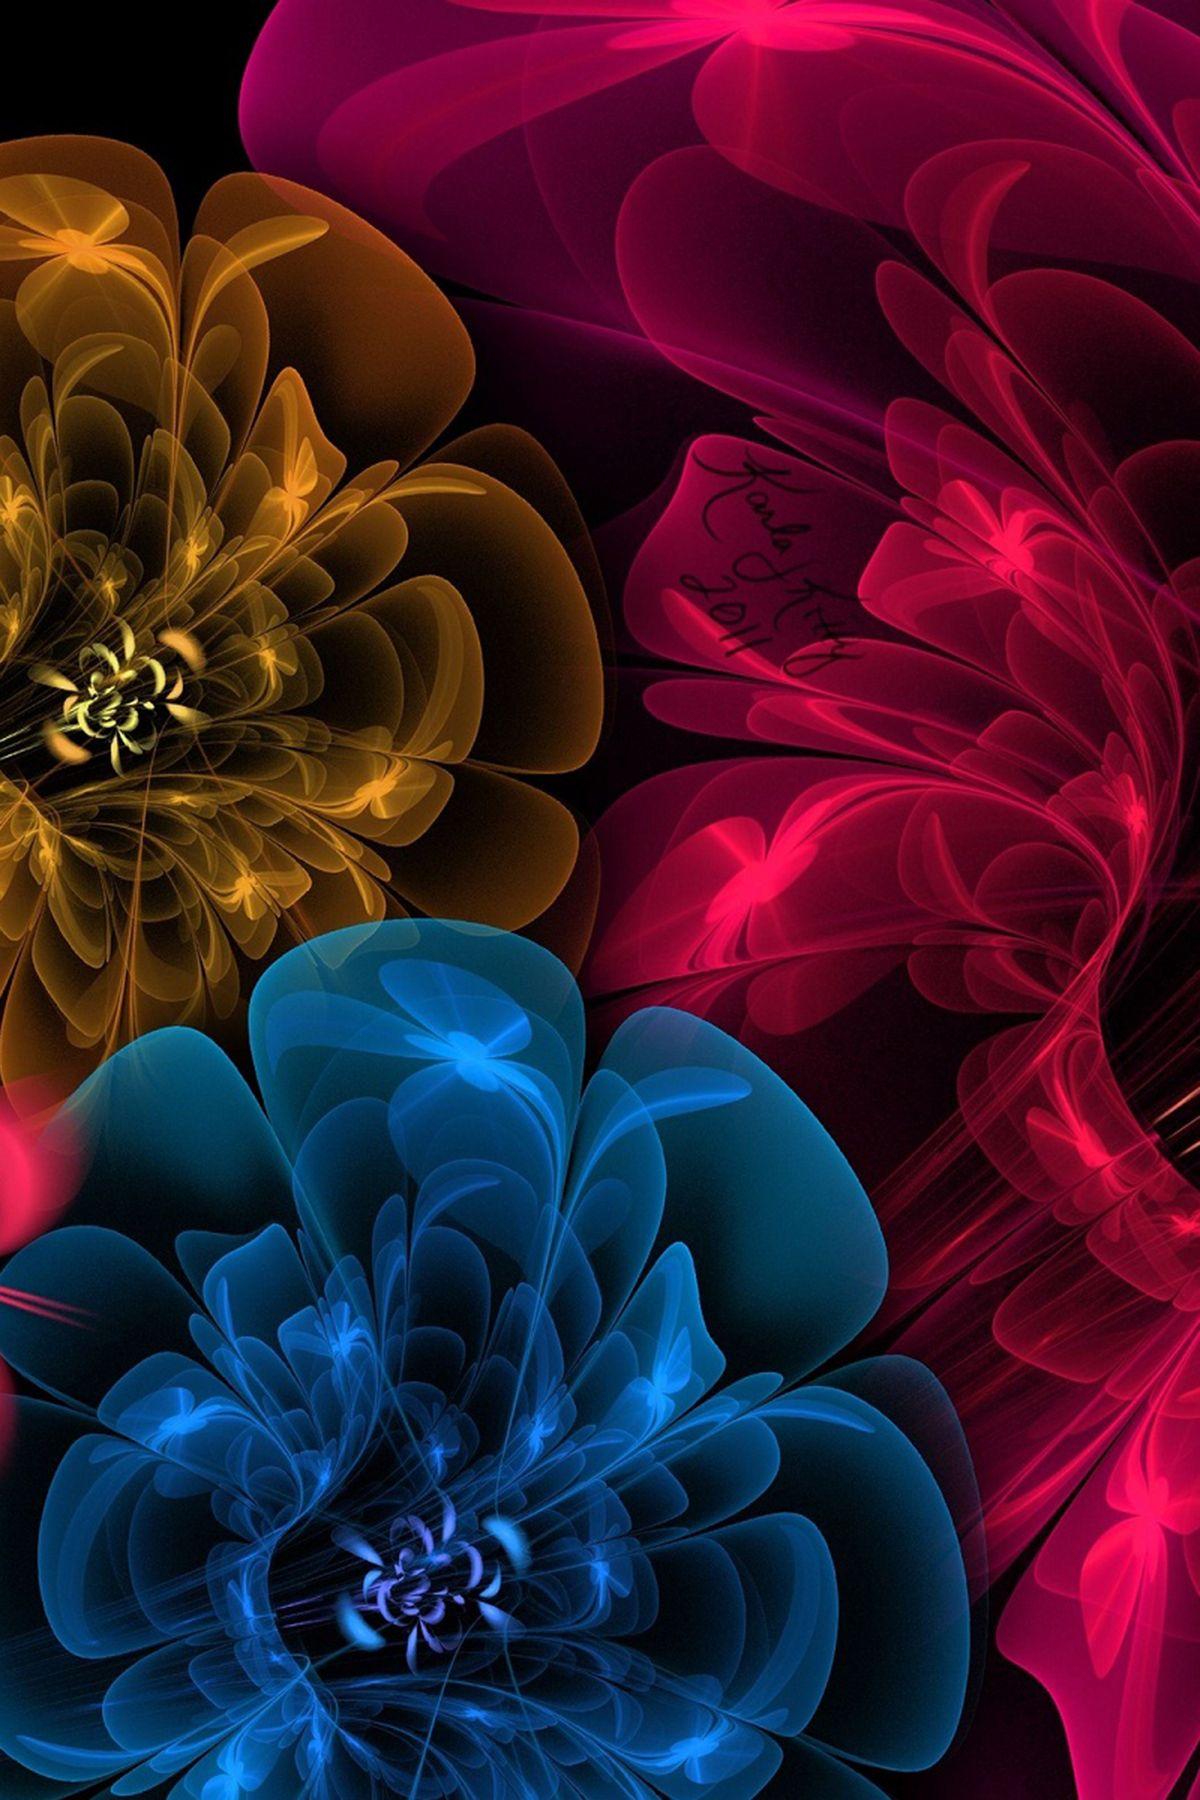 Digital Shine Colors Flowers In Black Hd Mobile Wallpaper Abstract Digital Shine Col Mobile Wallpaper Mobile Wallpaper Android Beautiful Flowers Wallpapers